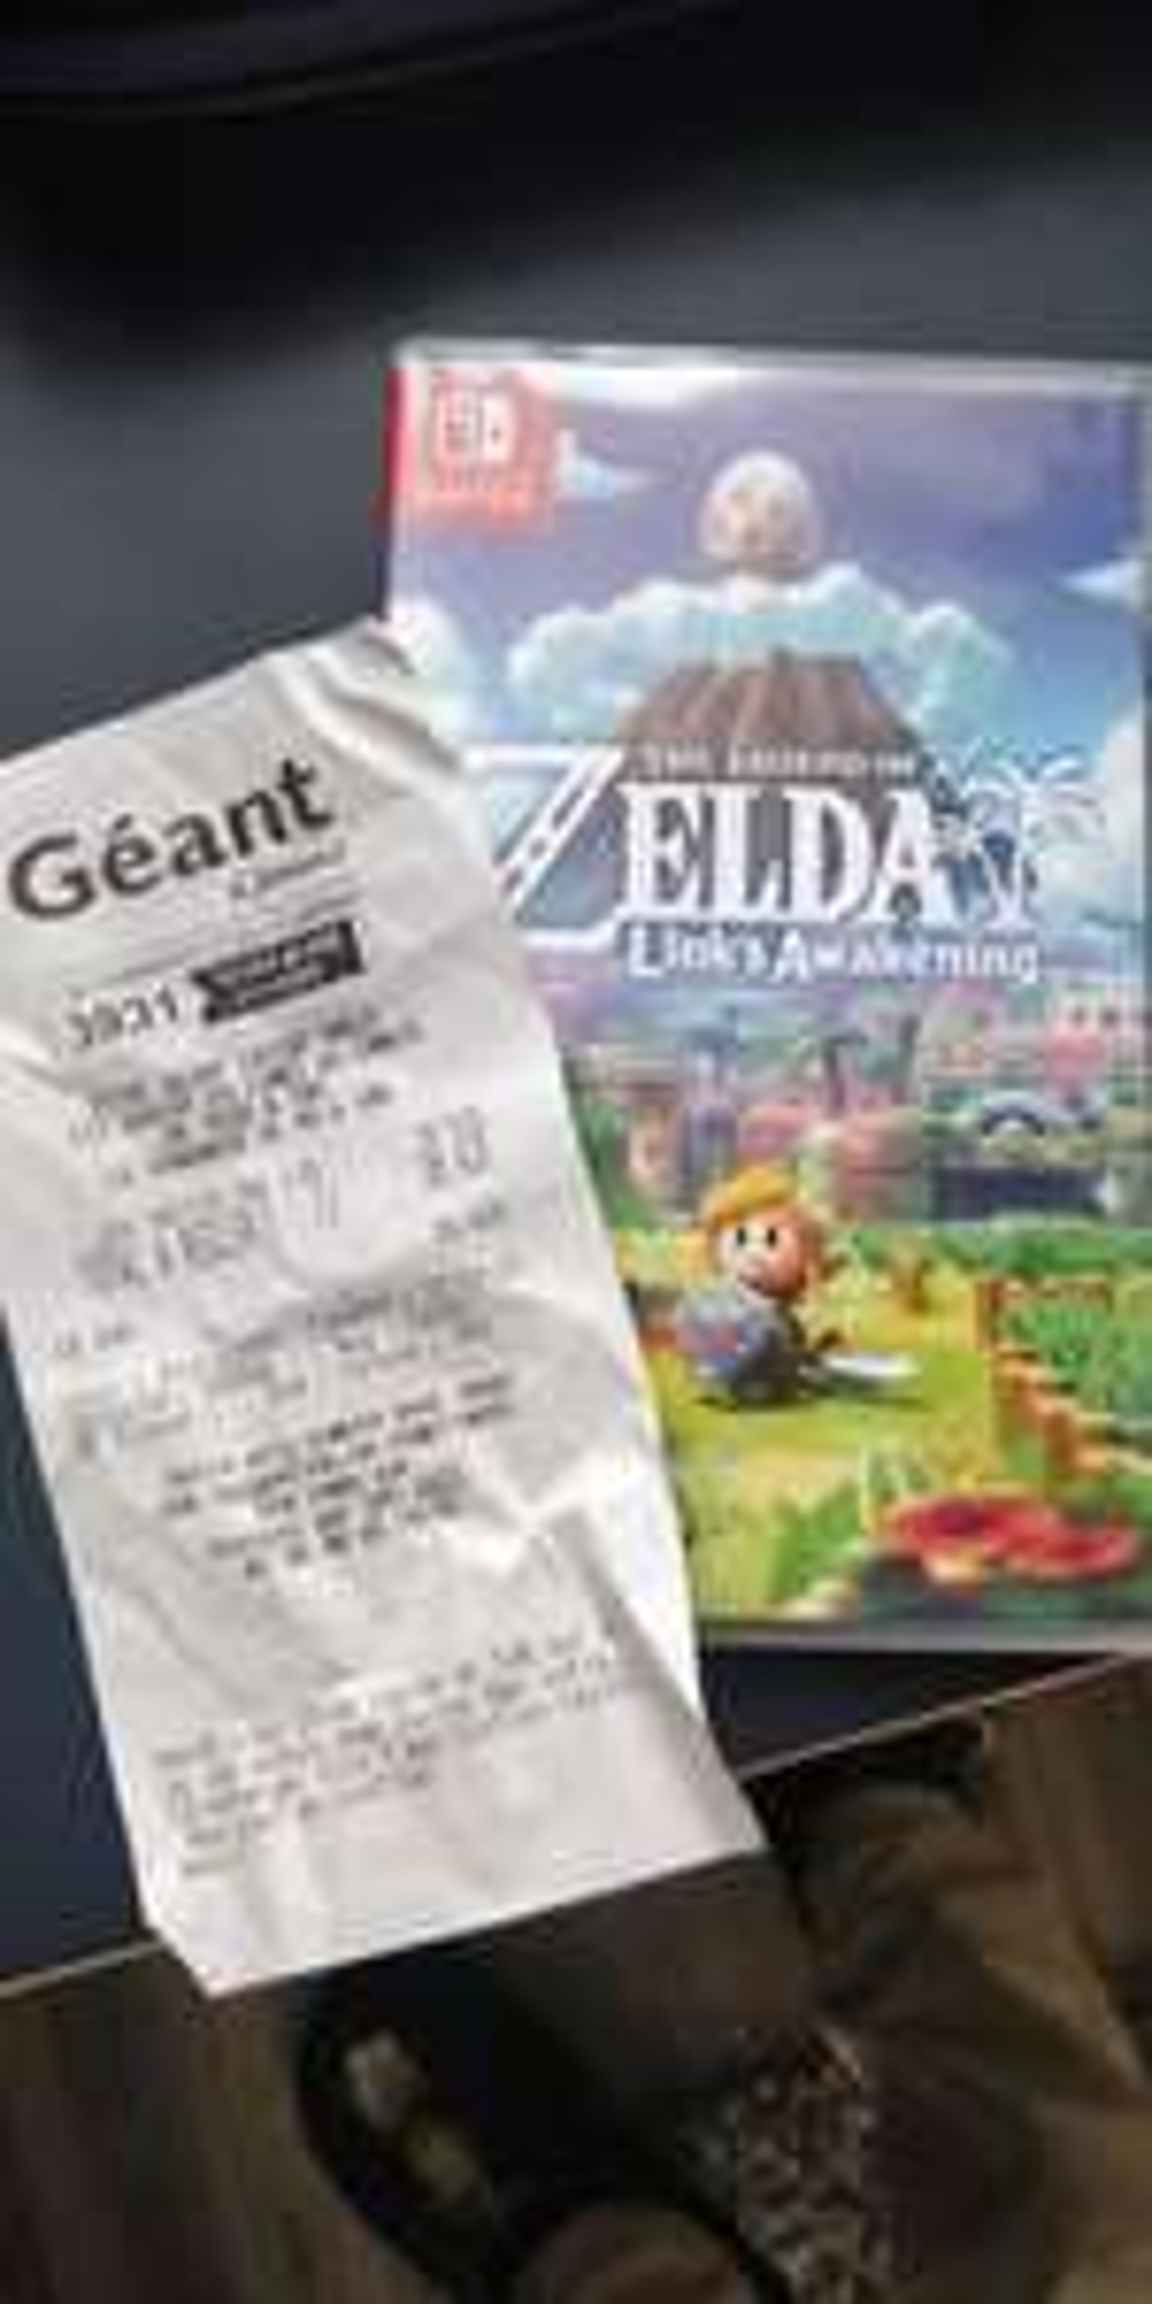 The Legend of Zelda Link's Awakening sur Nintendo Switch - Brest (29)